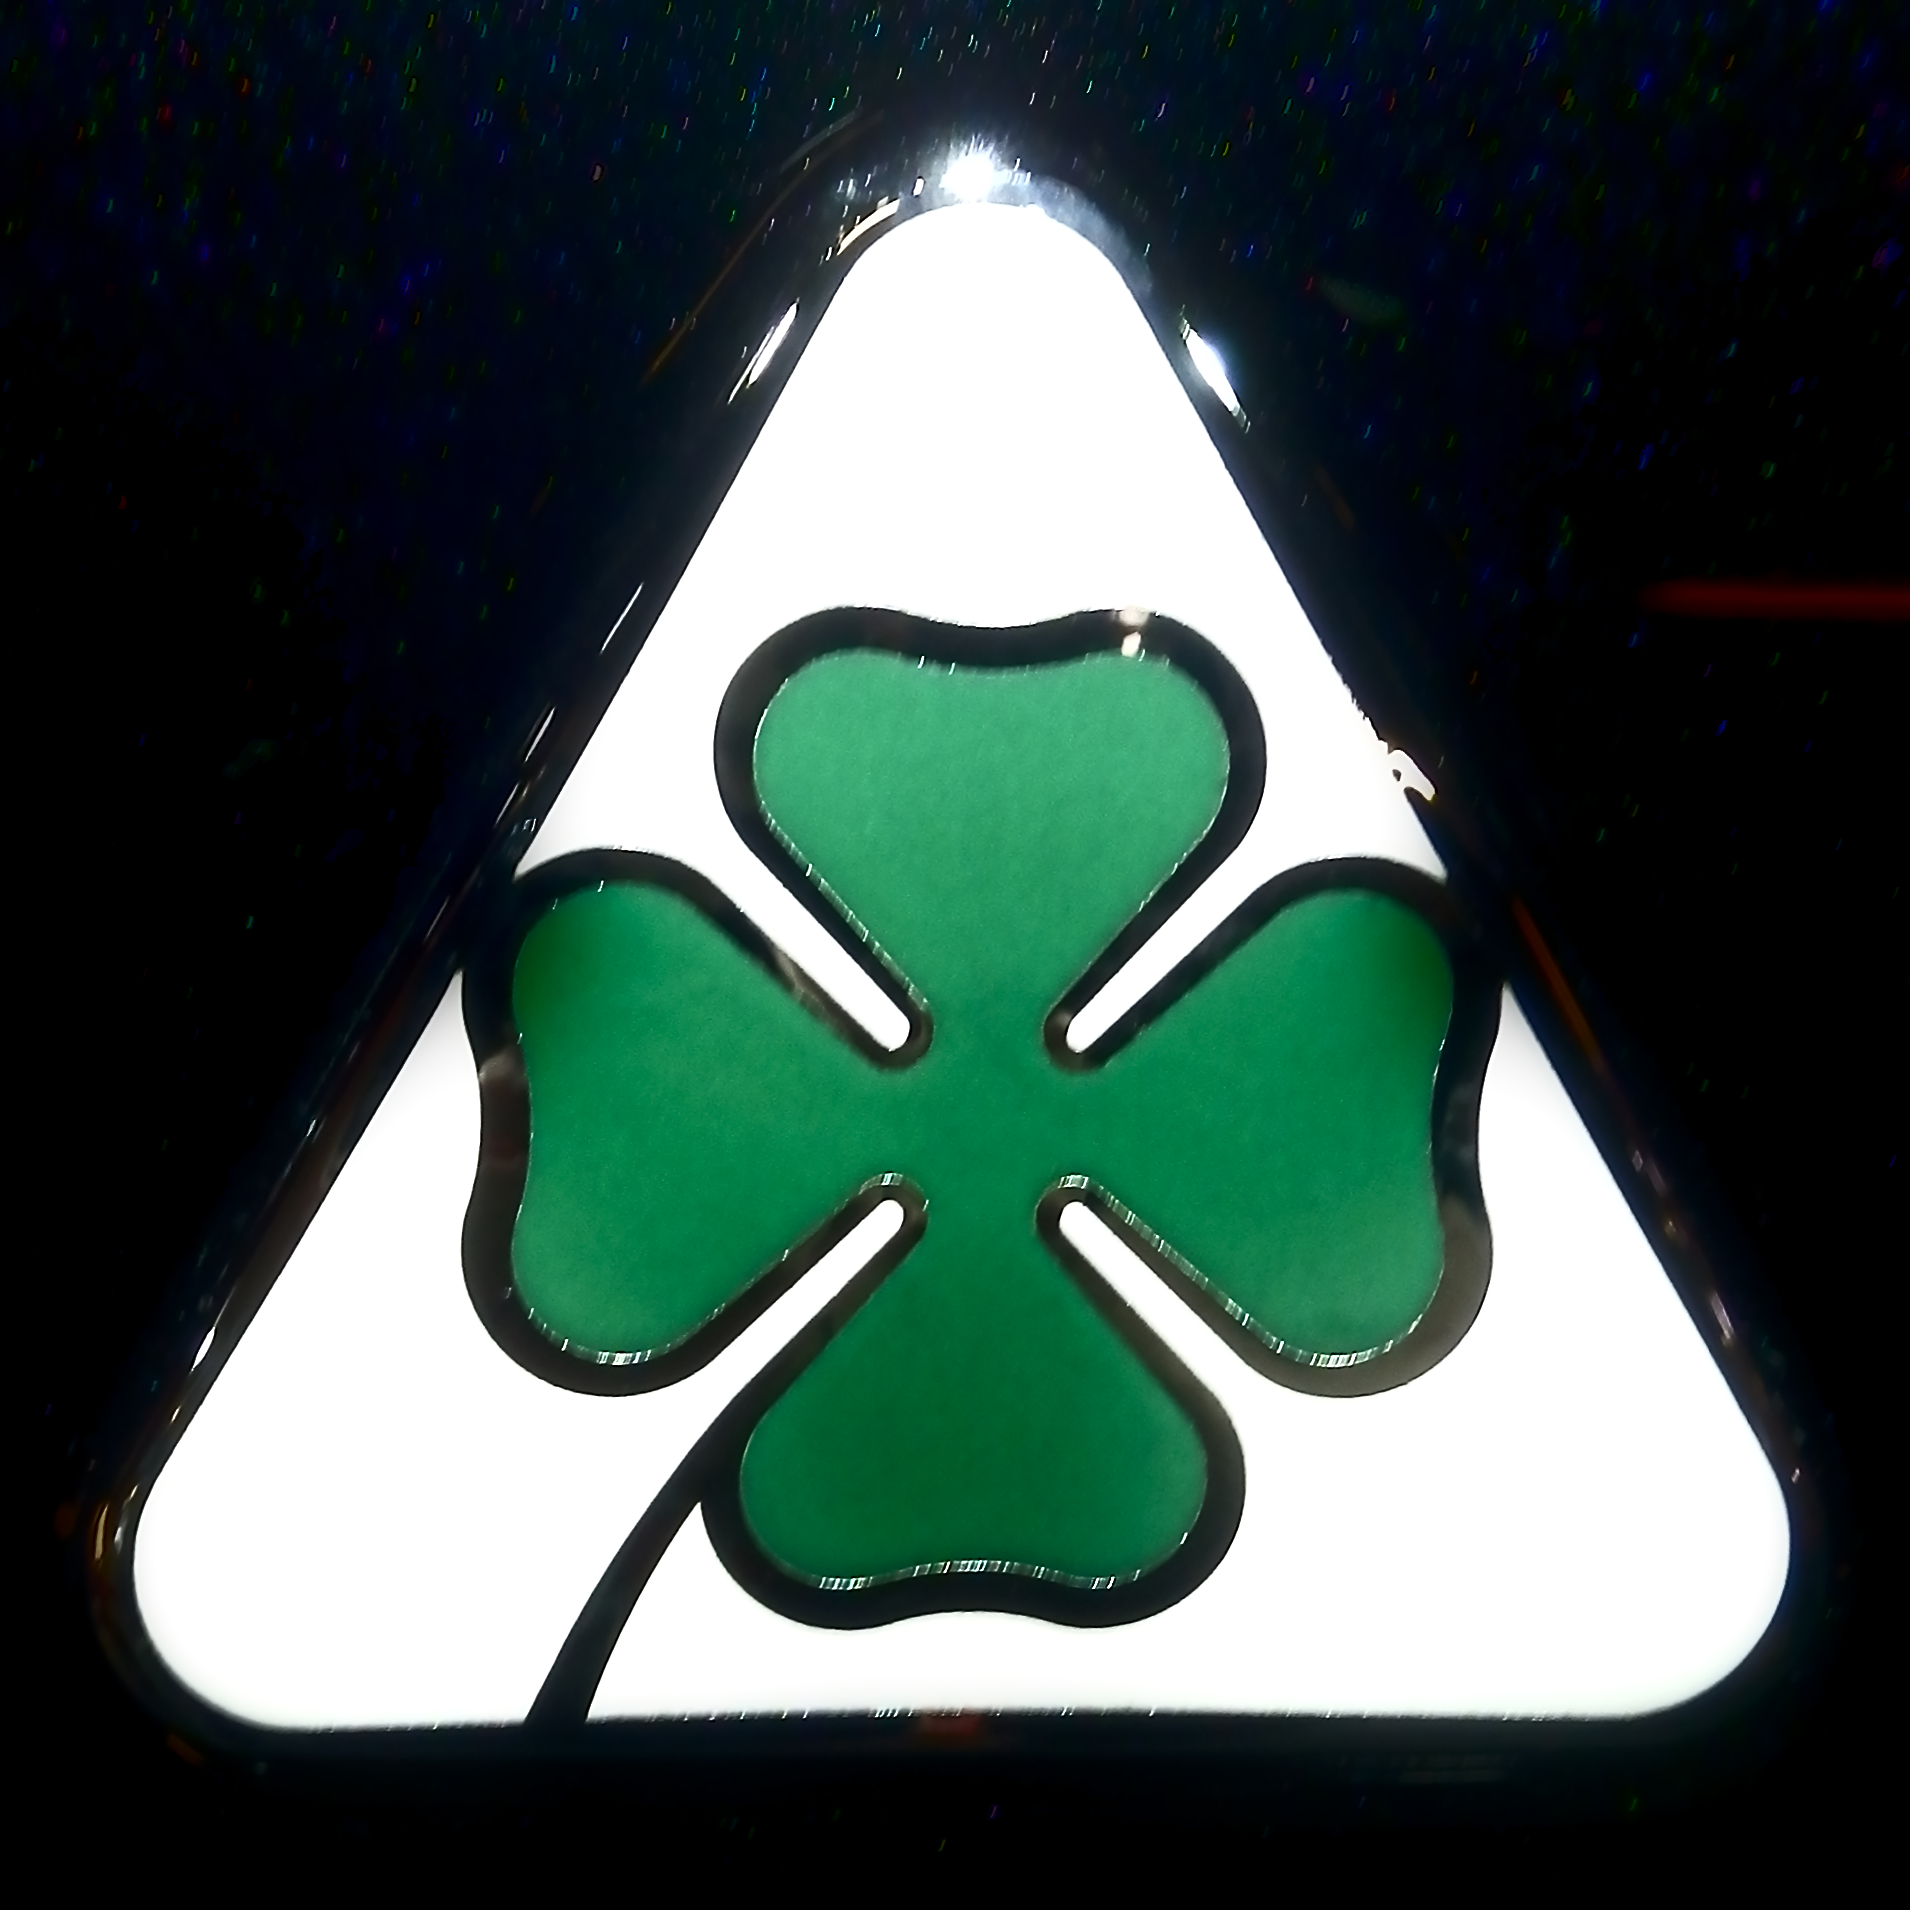 Dateialfa Romeo Qv Logo Iaa 2015 Wikipedia Alfa Symbol